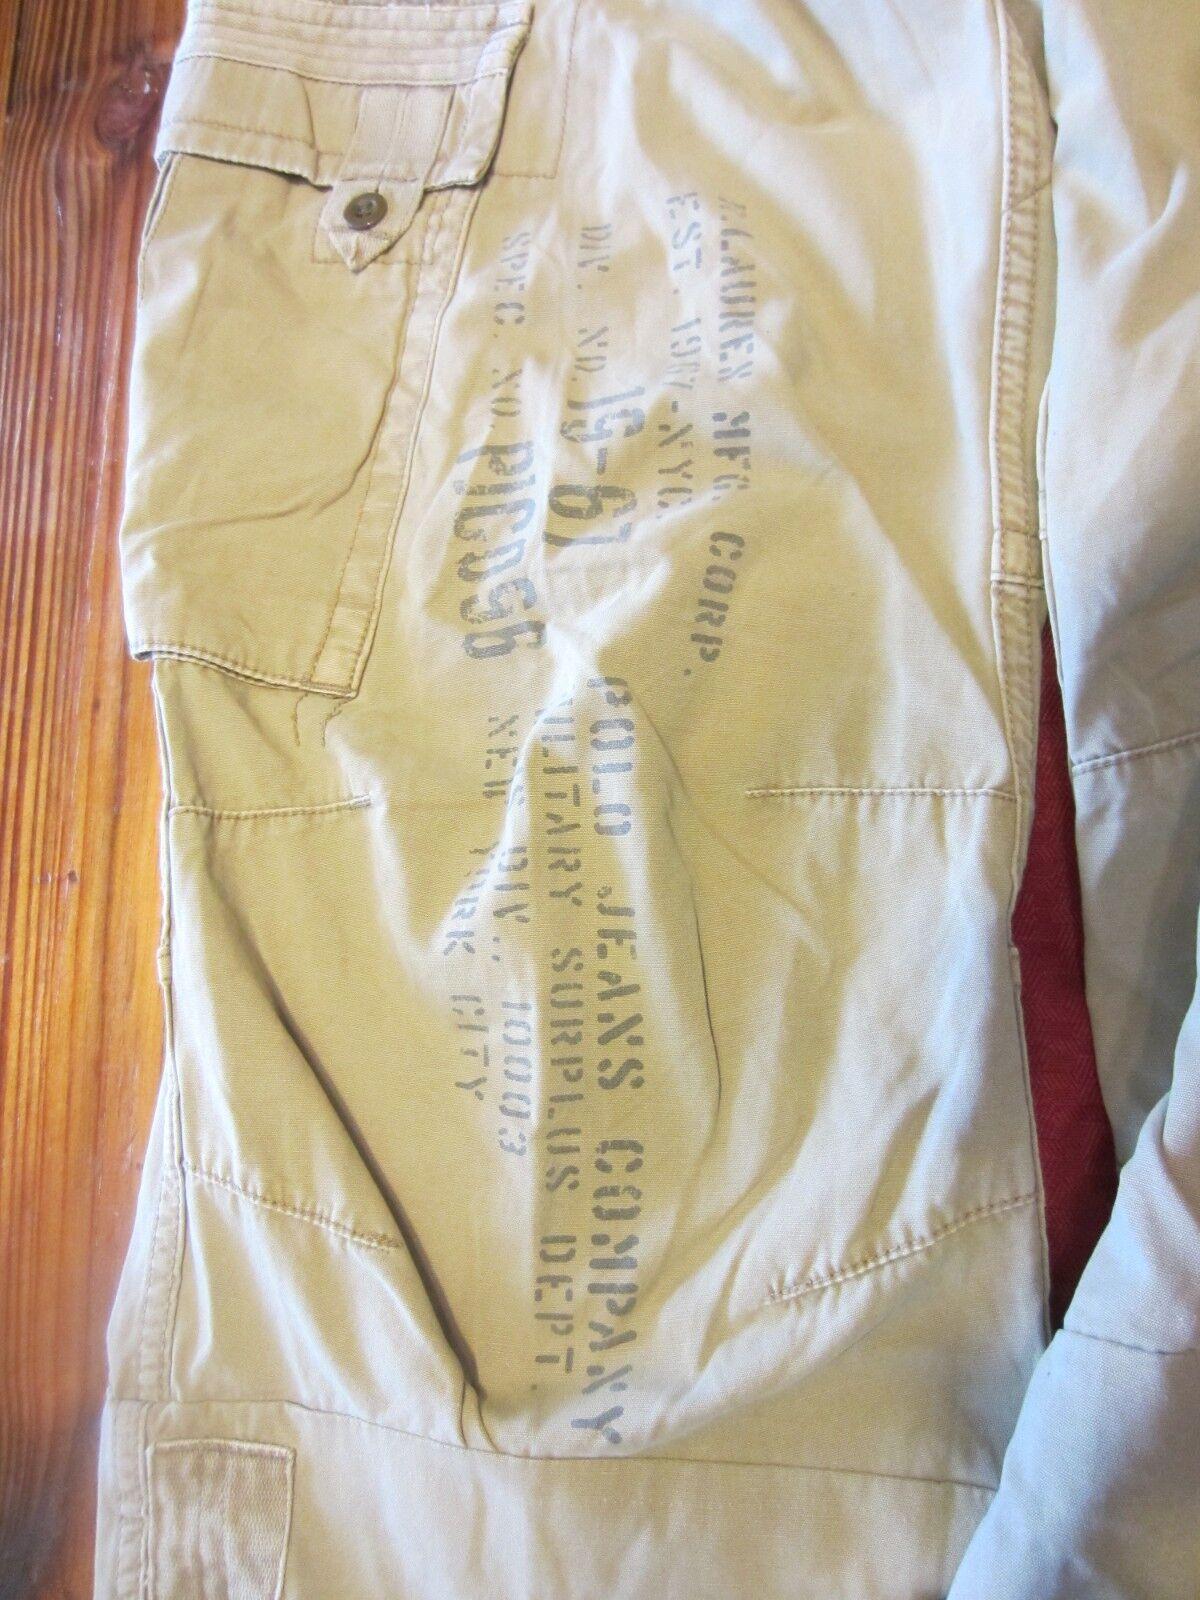 3369cb635 VTG Ralph Lauren Polo Cargo Pants Size 32x30(26) RARE 90s 19-67 ...